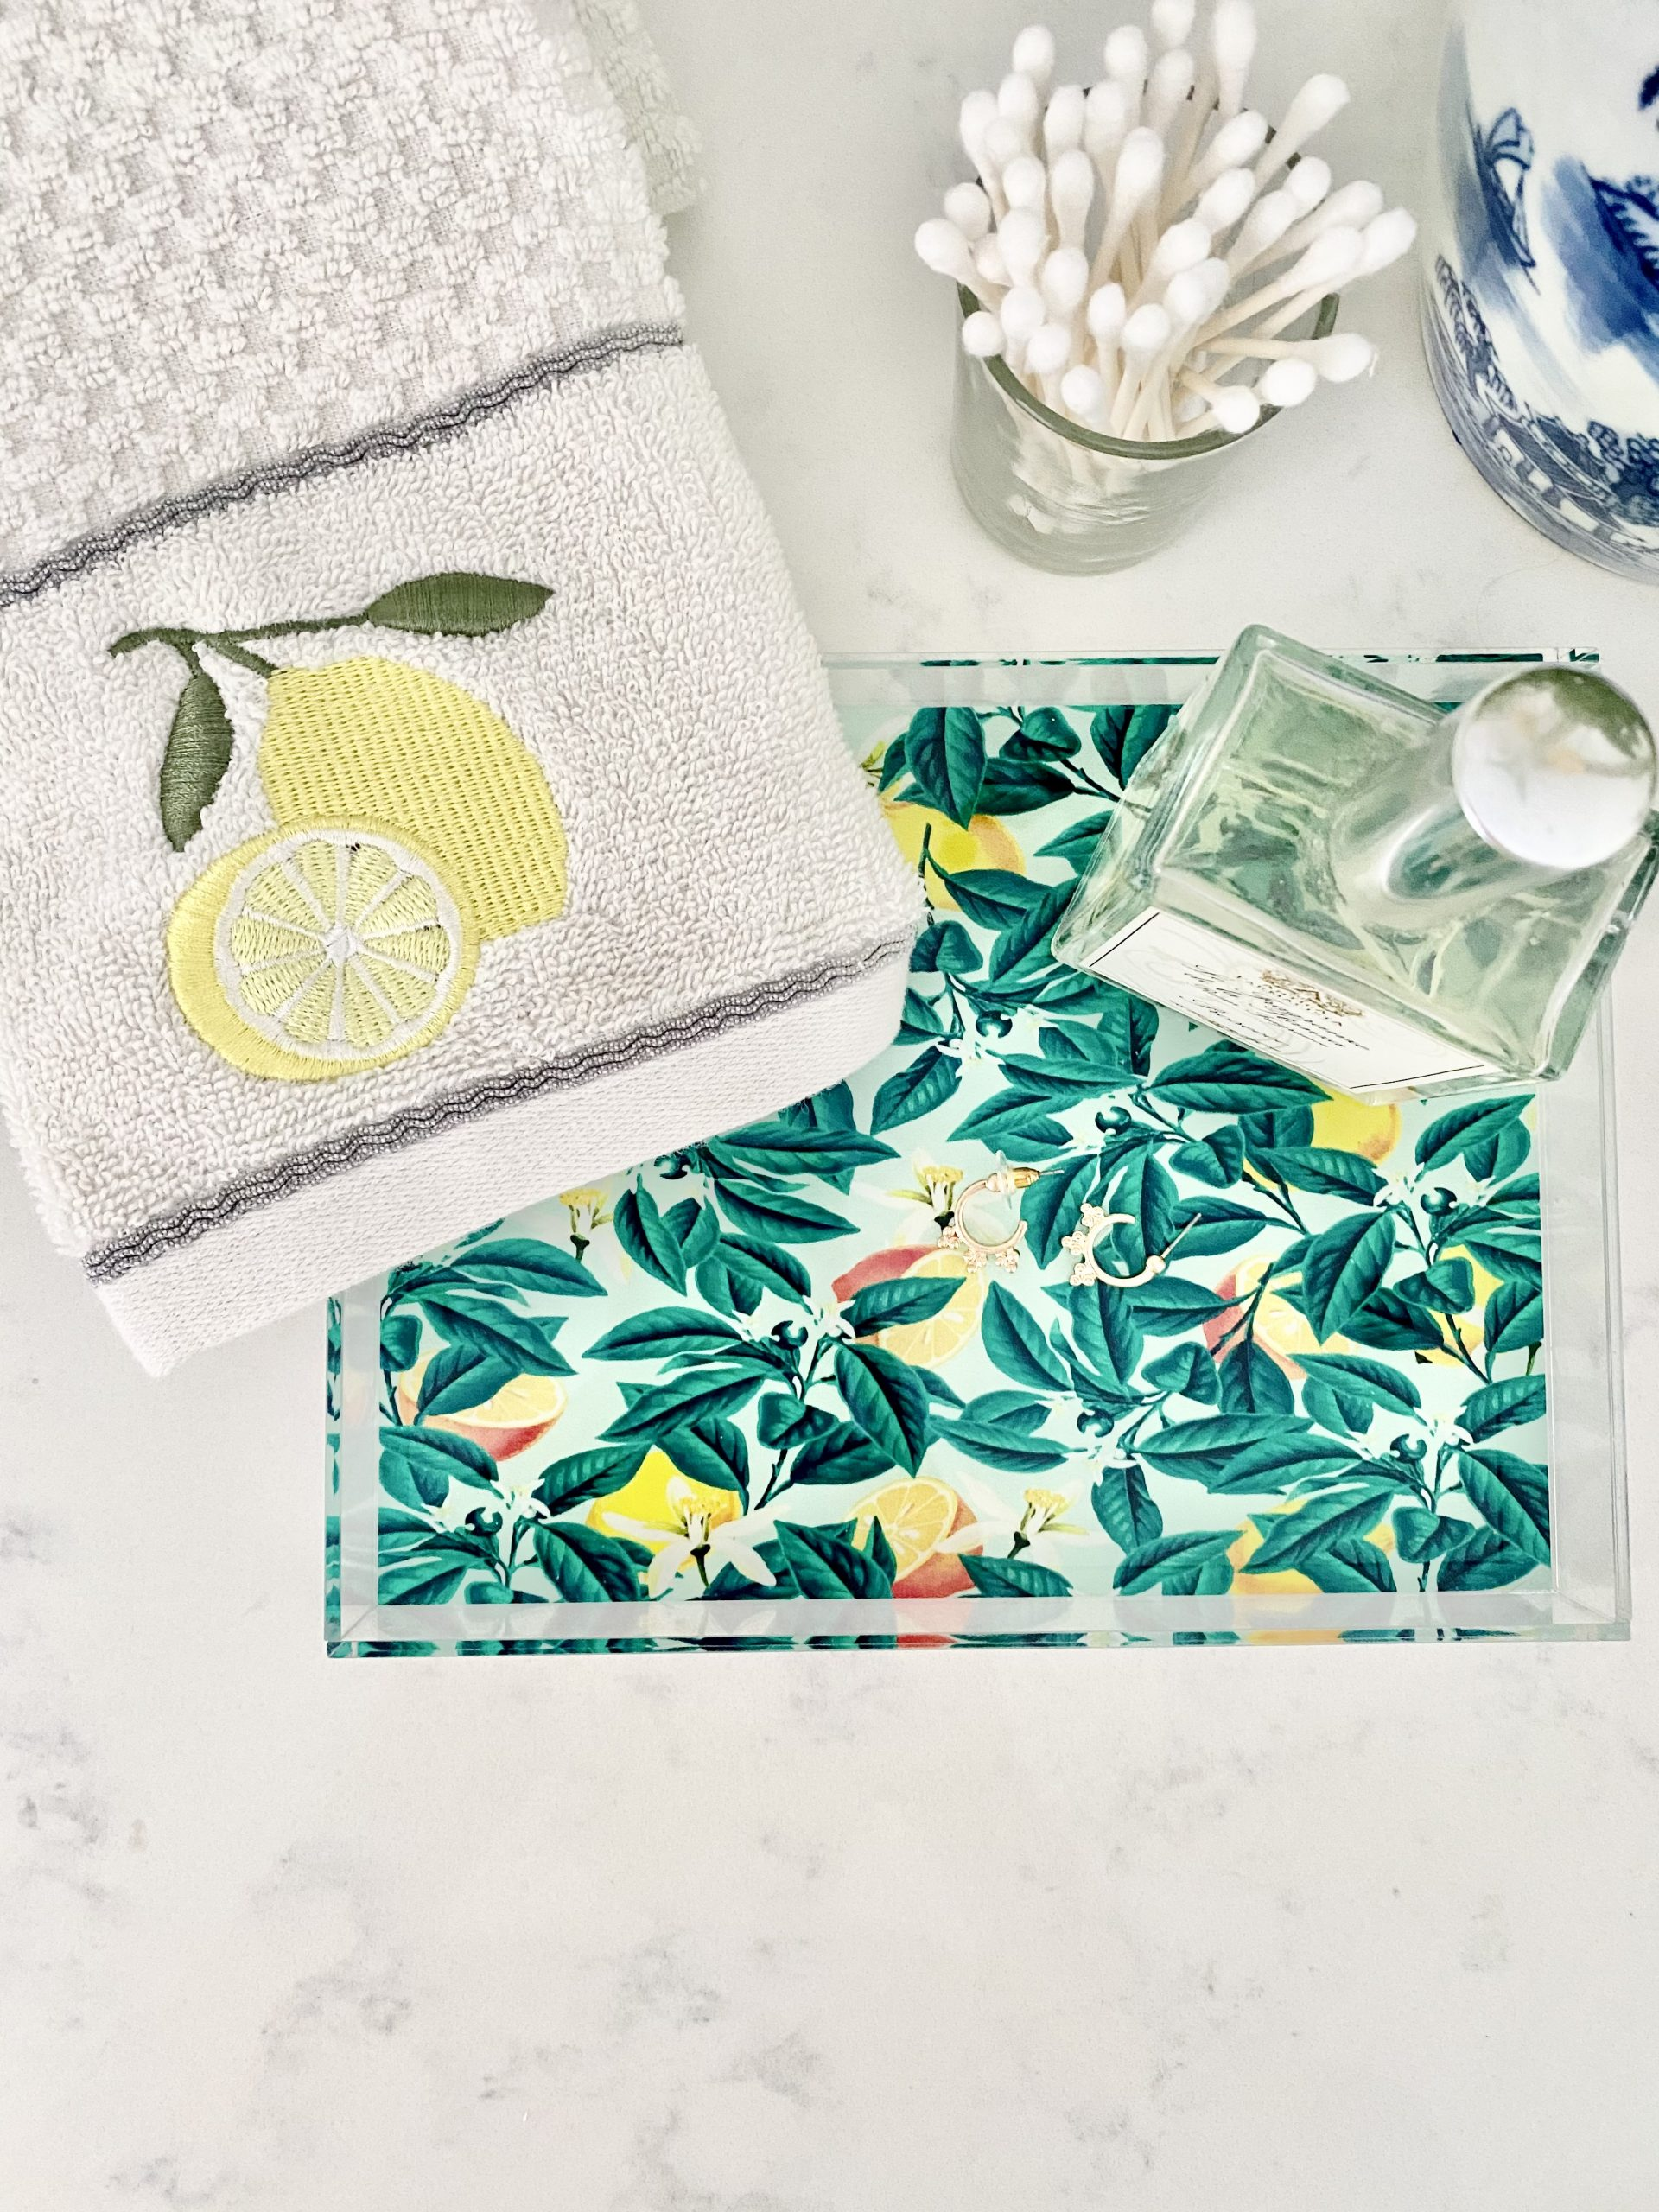 Easy-Summer-Refresh-Ideas-Bathroom-Walmart-Home